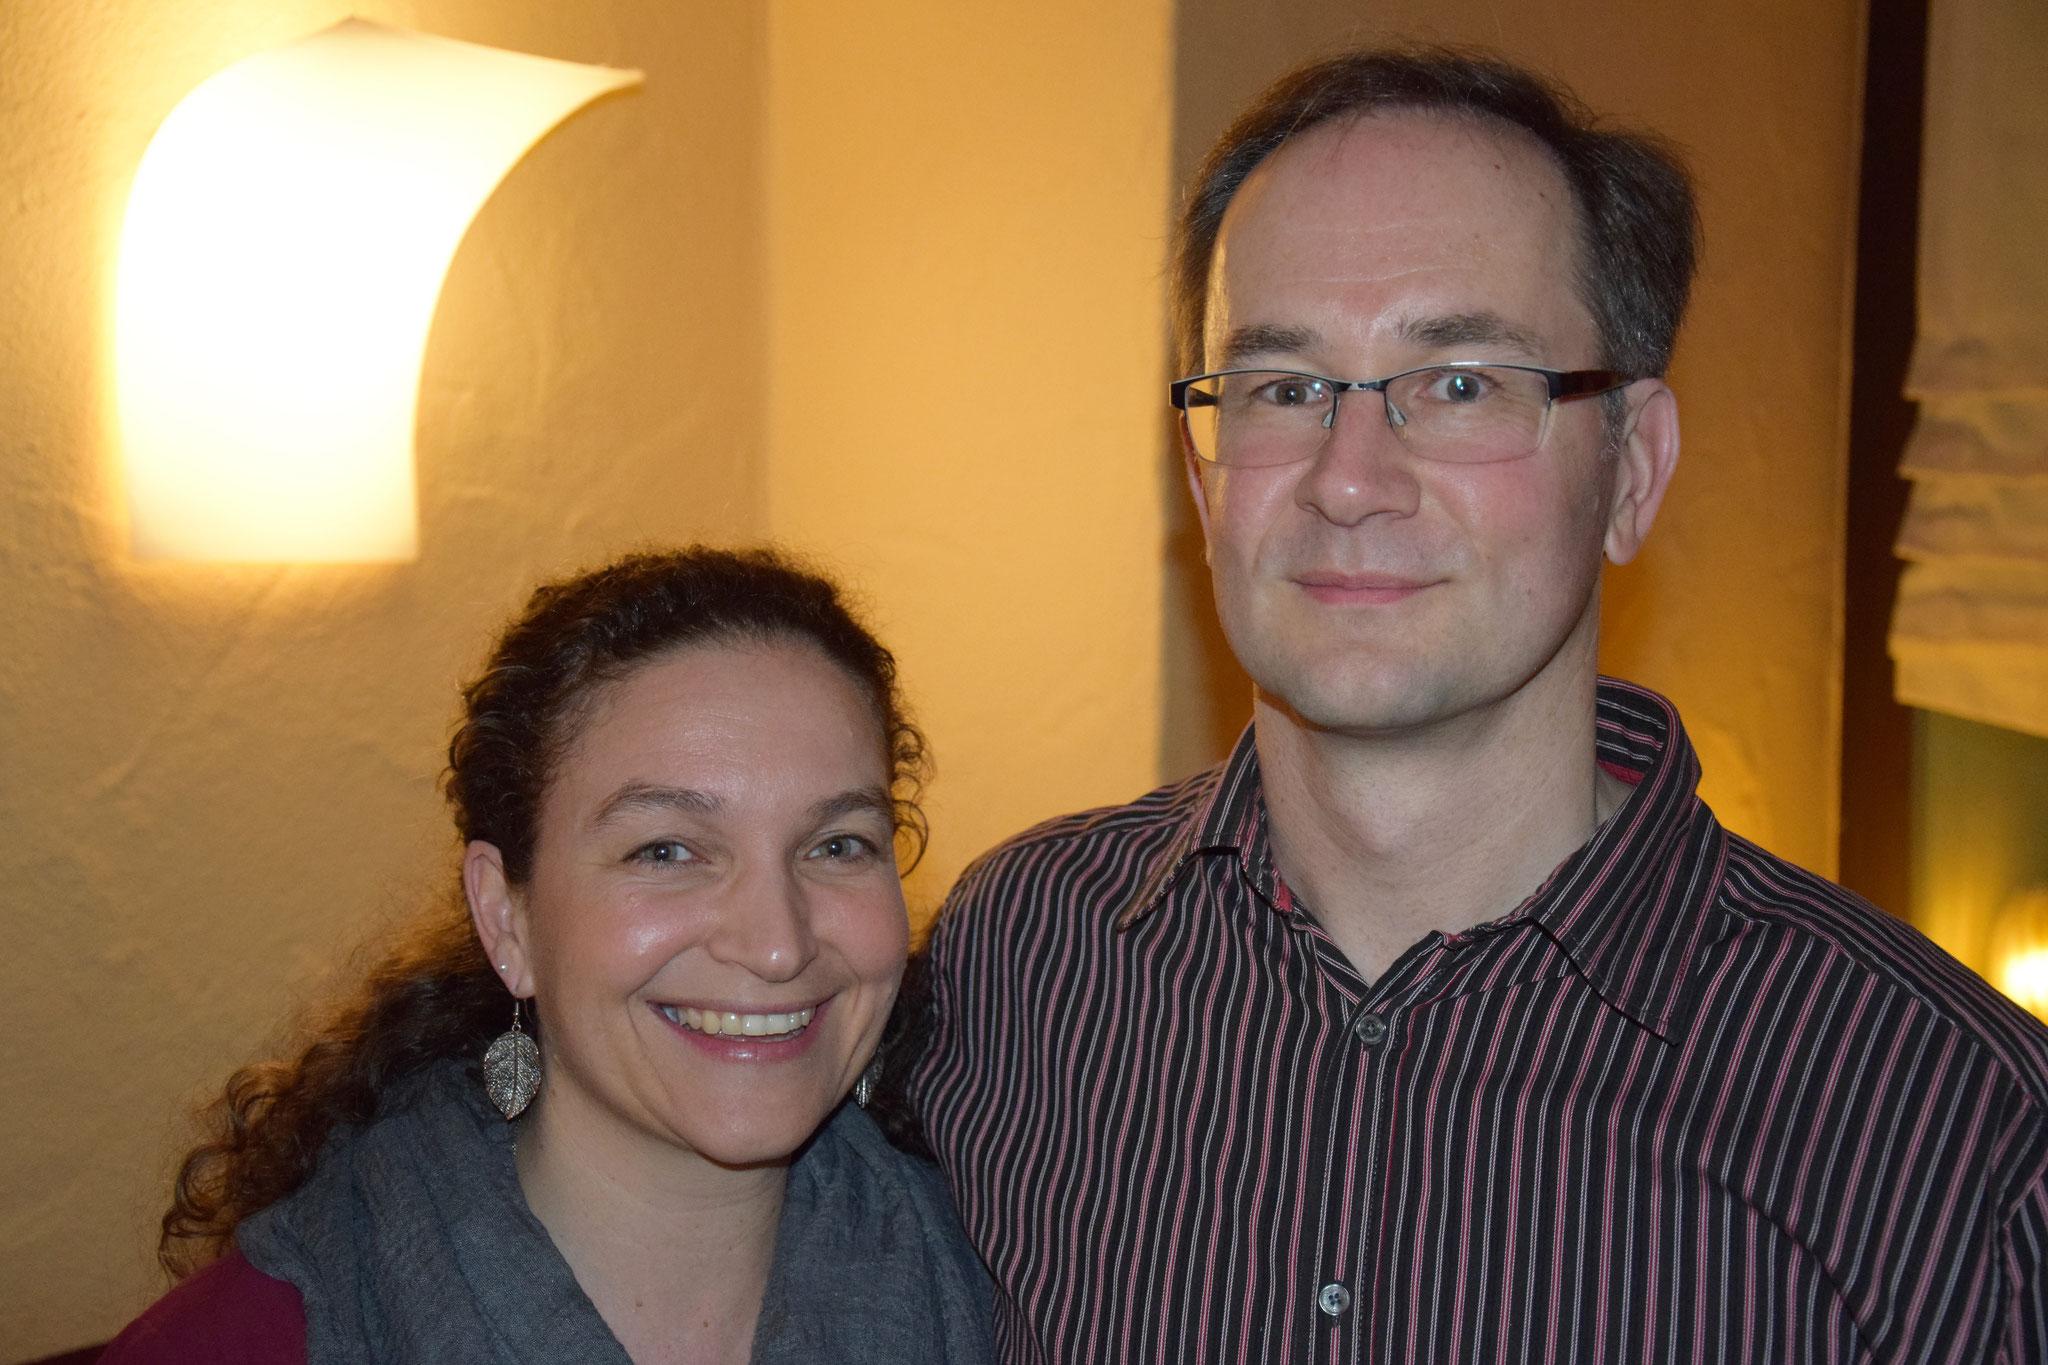 Bürgermeisterkandidat Jochen Drechsler mit Frau Annette